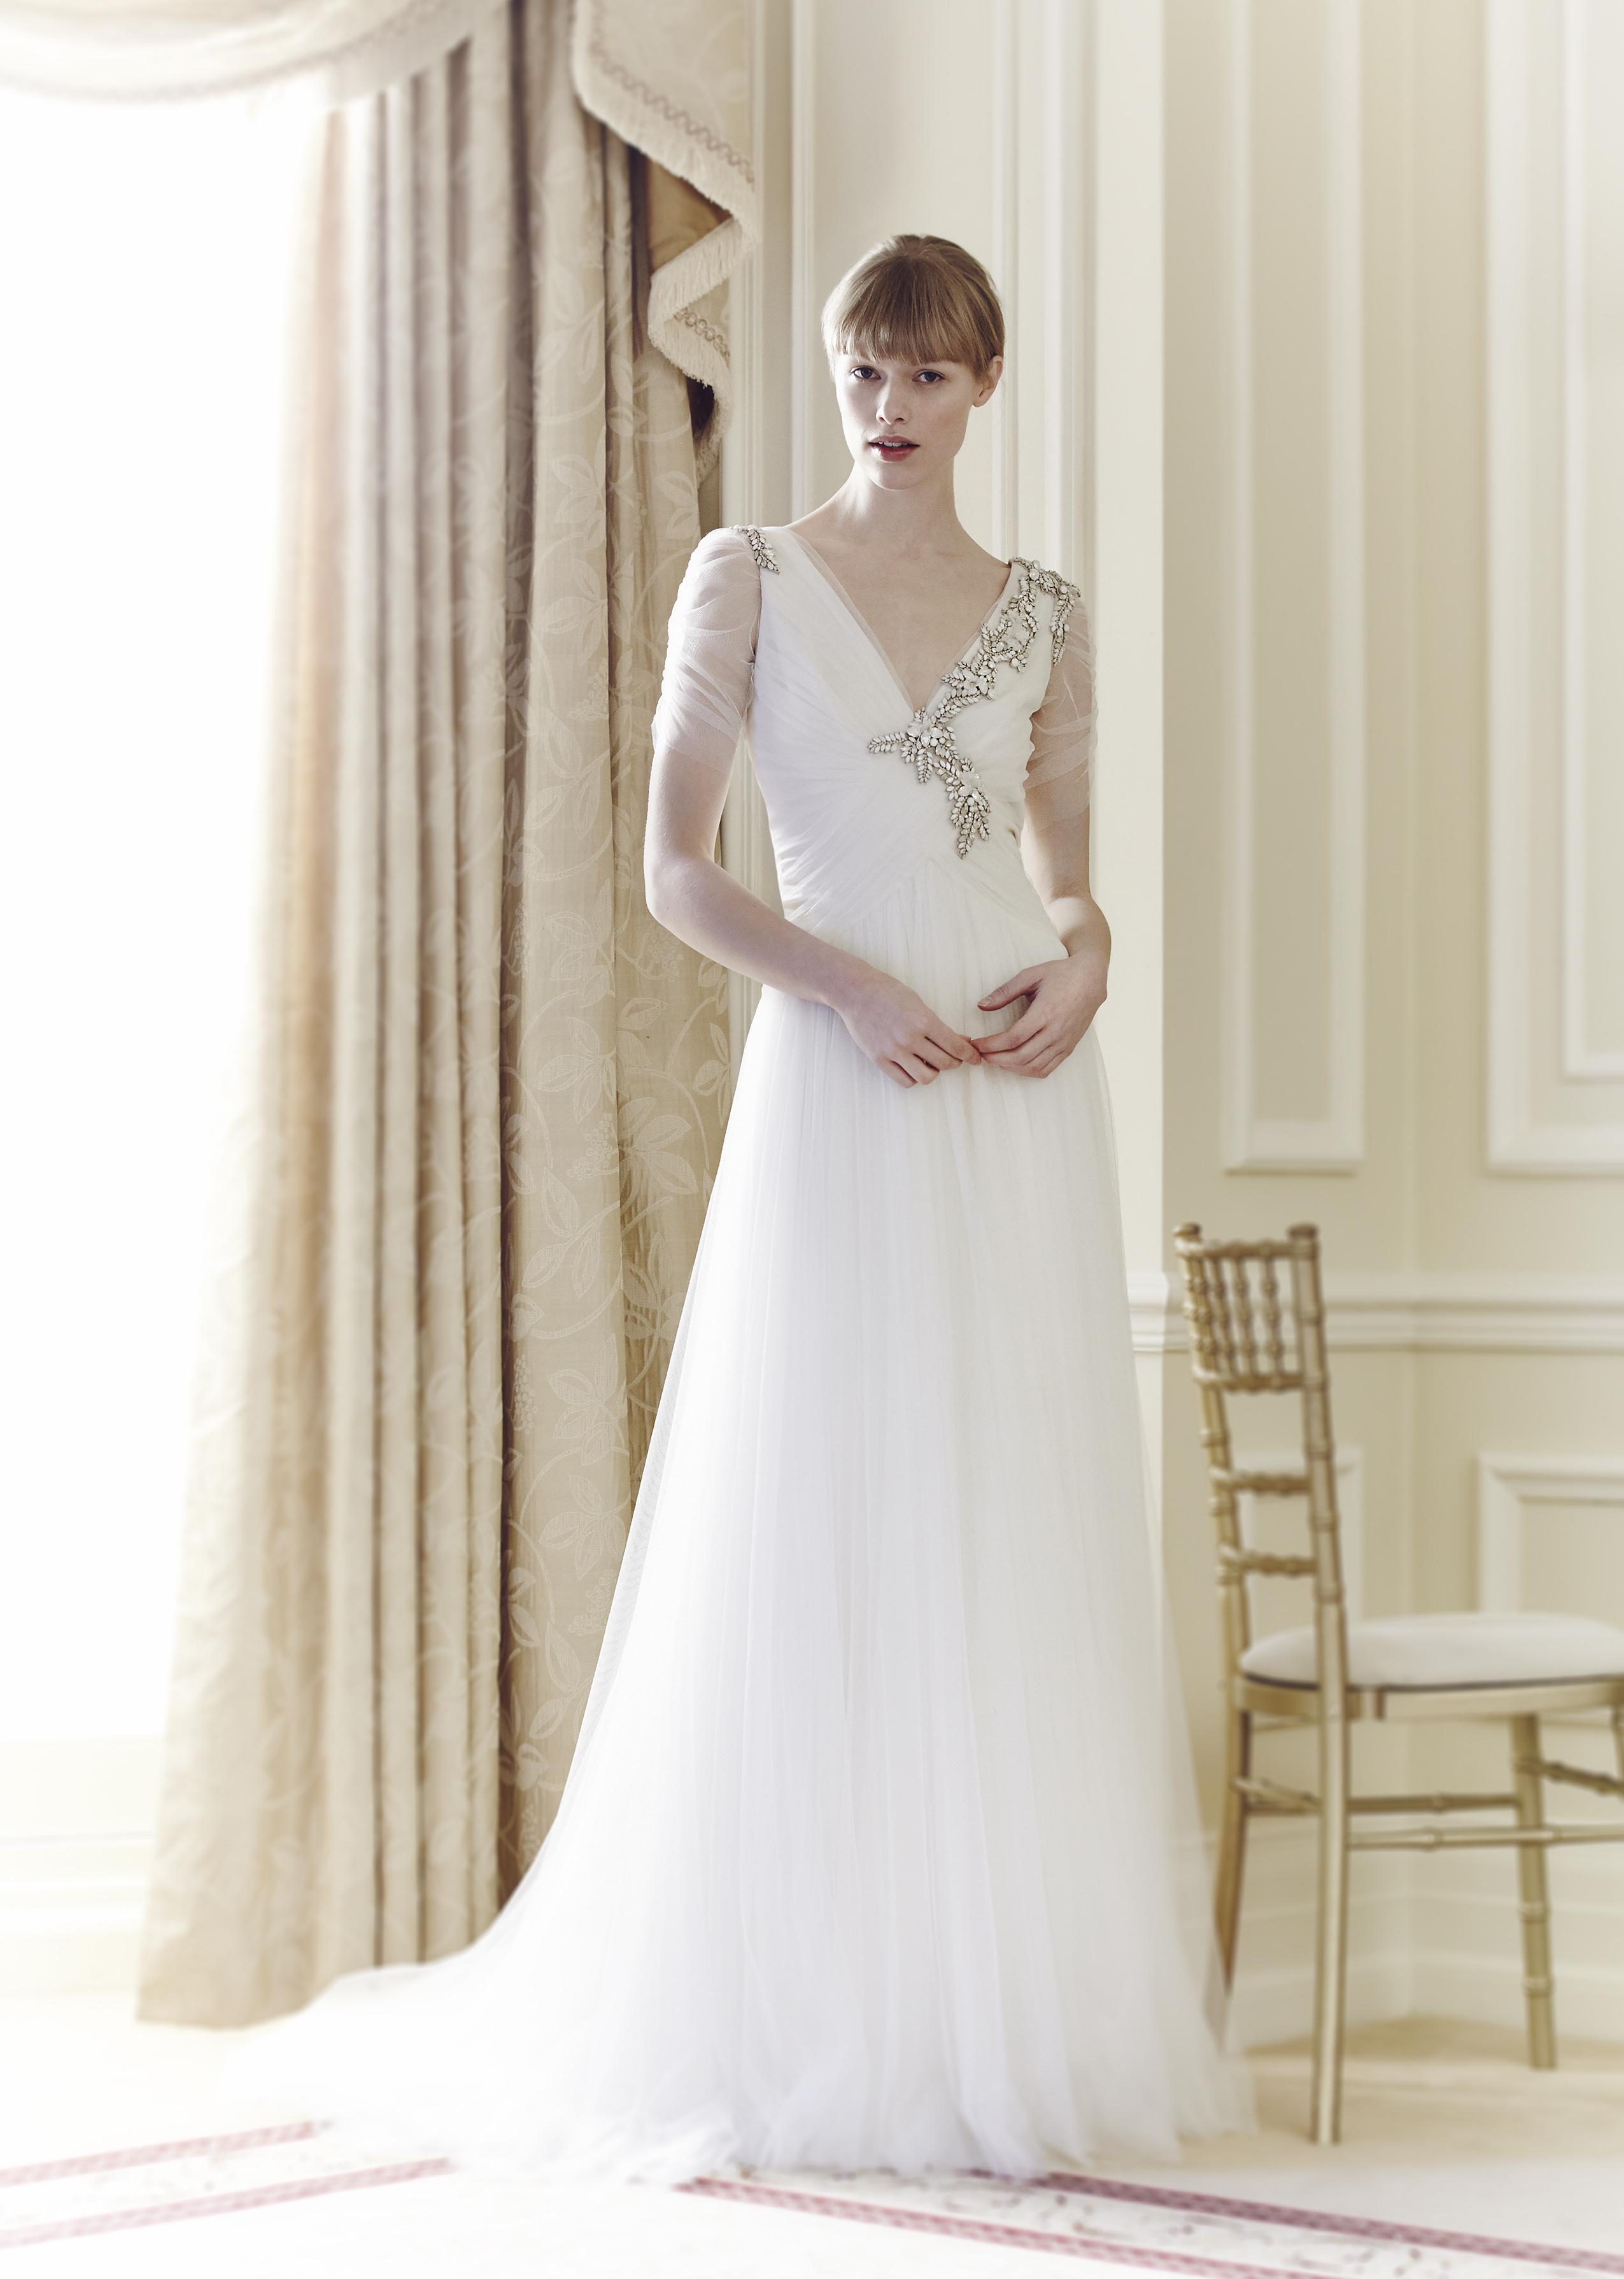 Wedding Dresses, Romantic Wedding Dresses, Vintage Wedding Dresses, Hollywood Glam Wedding Dresses, Fashion, Winter Weddings, Glam Weddings, Jenny packham, Wedding Dresses with Sleeves, Art Deco Weddings